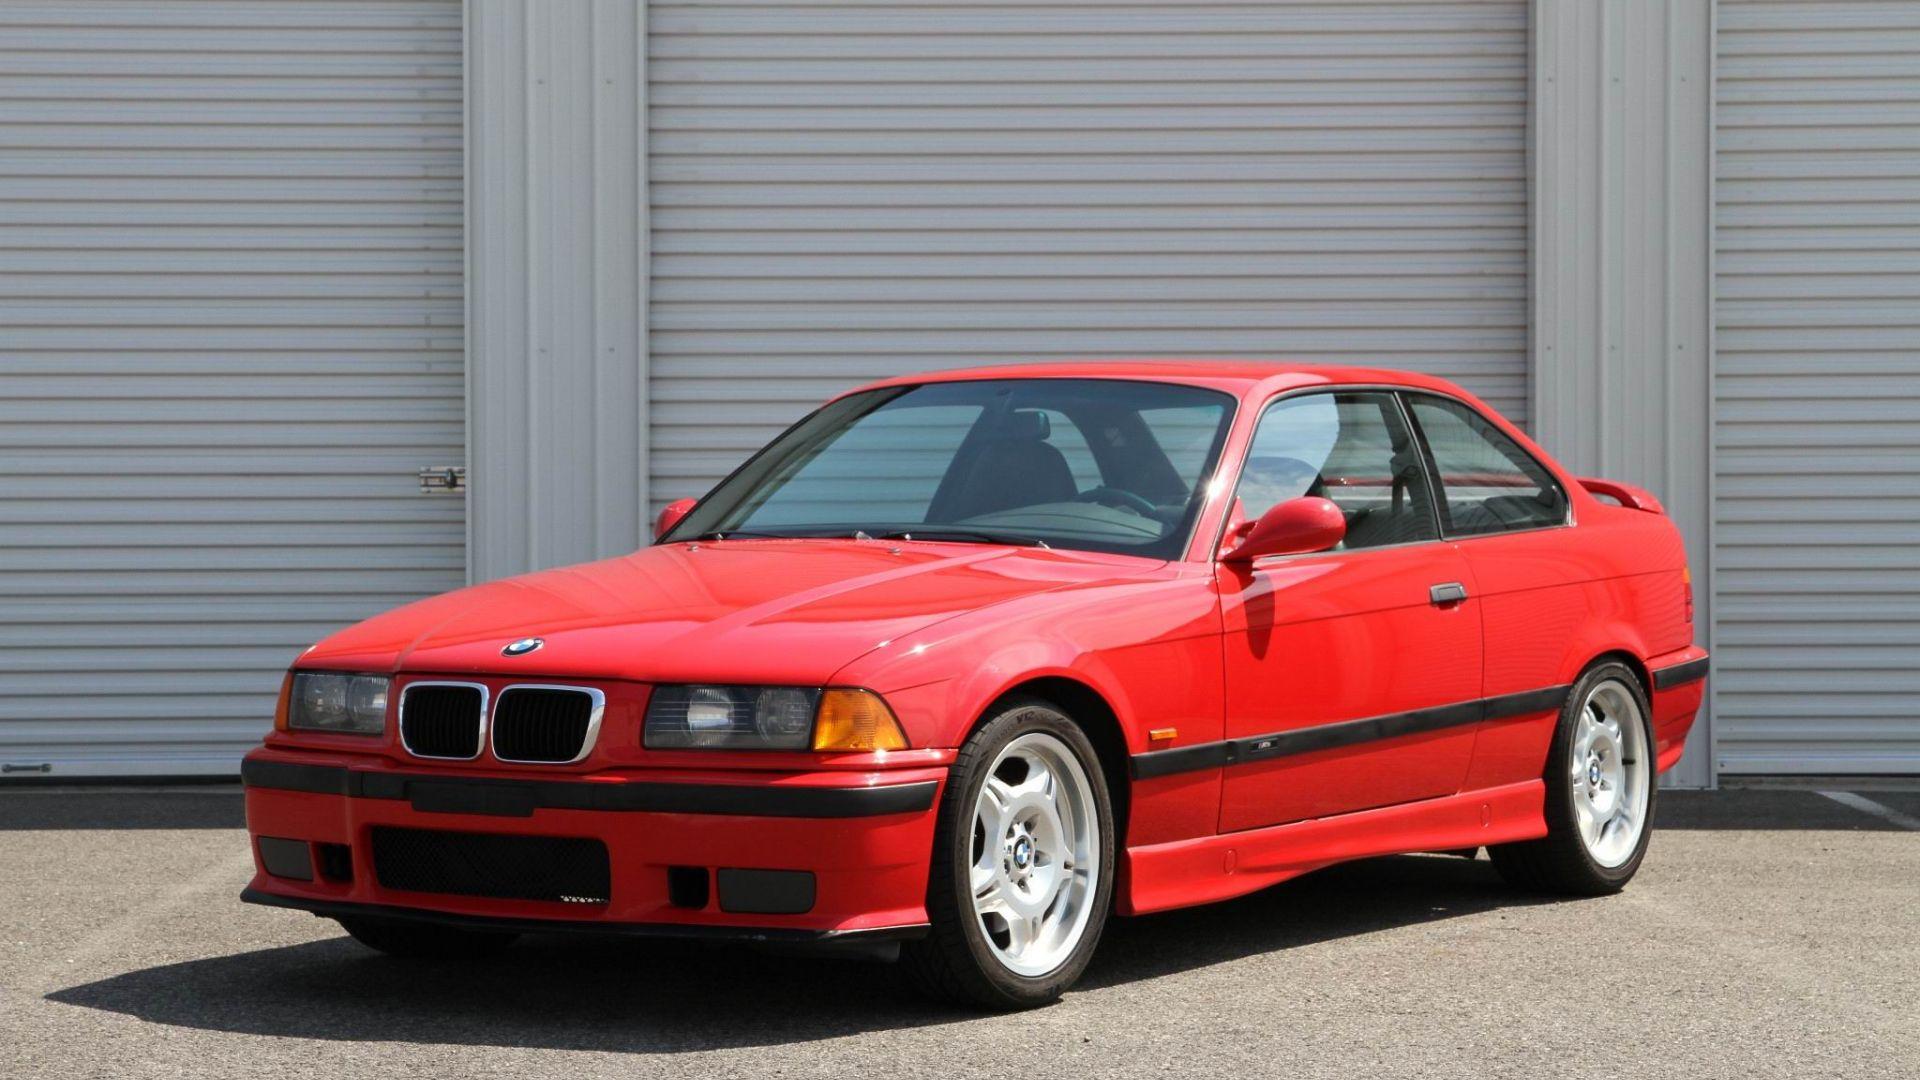 Desktop Wallpaper Red Bmw M3 Coupe Classic Car Hd Image Picture Background 3d81cc